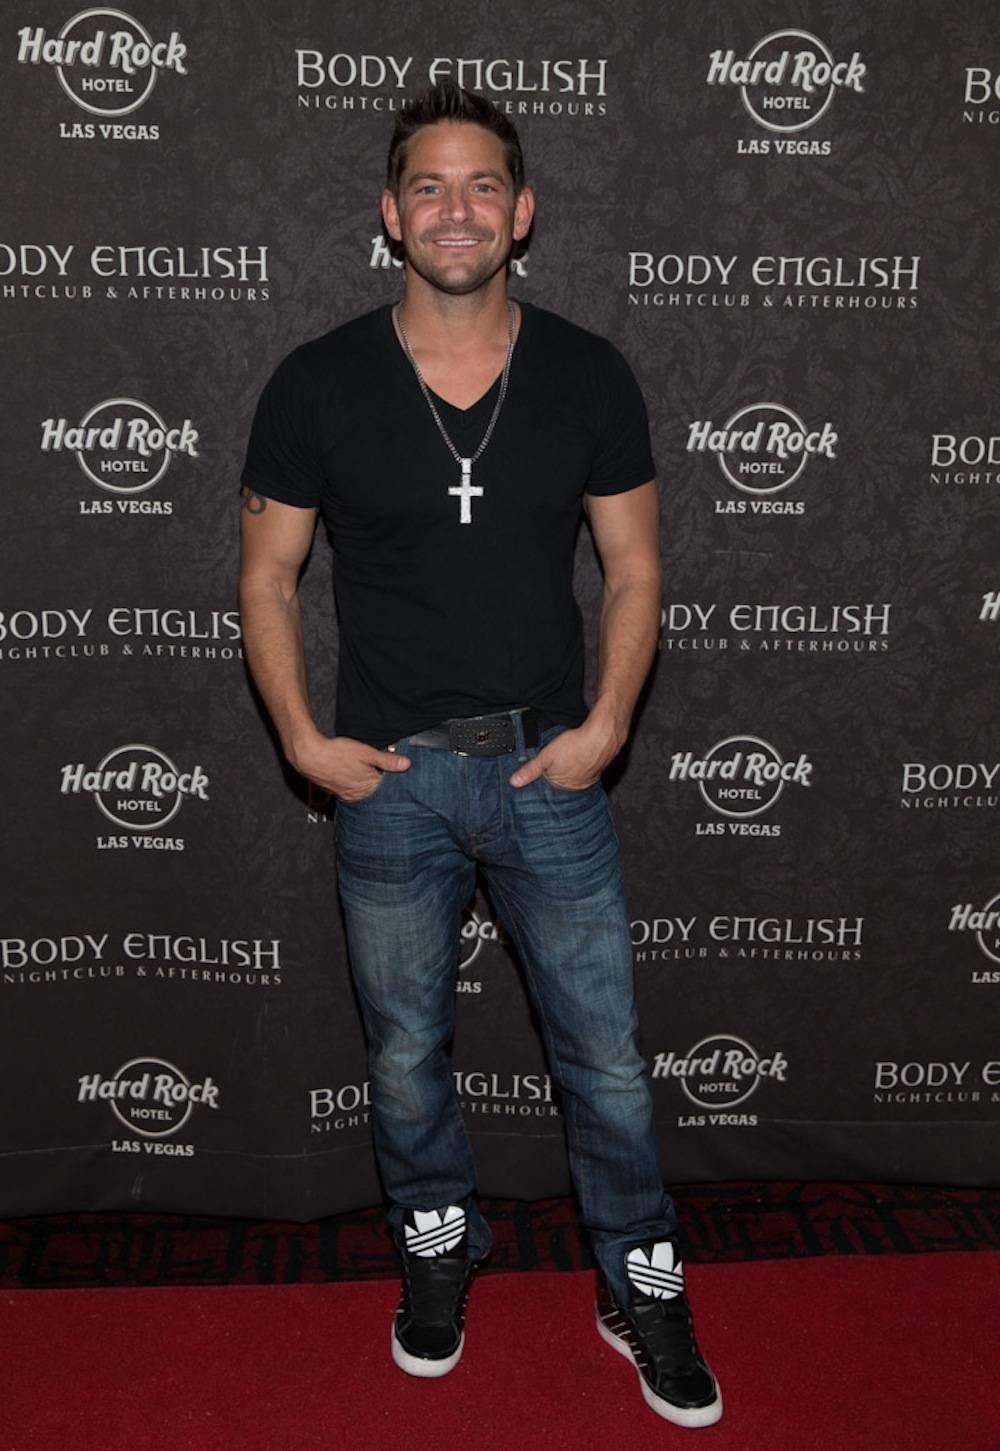 9.1.13 Jeff Timmons at Body English Nightclub & Afterhours in Hard Rock Hotel & Casino, photo credit Erik Kabik